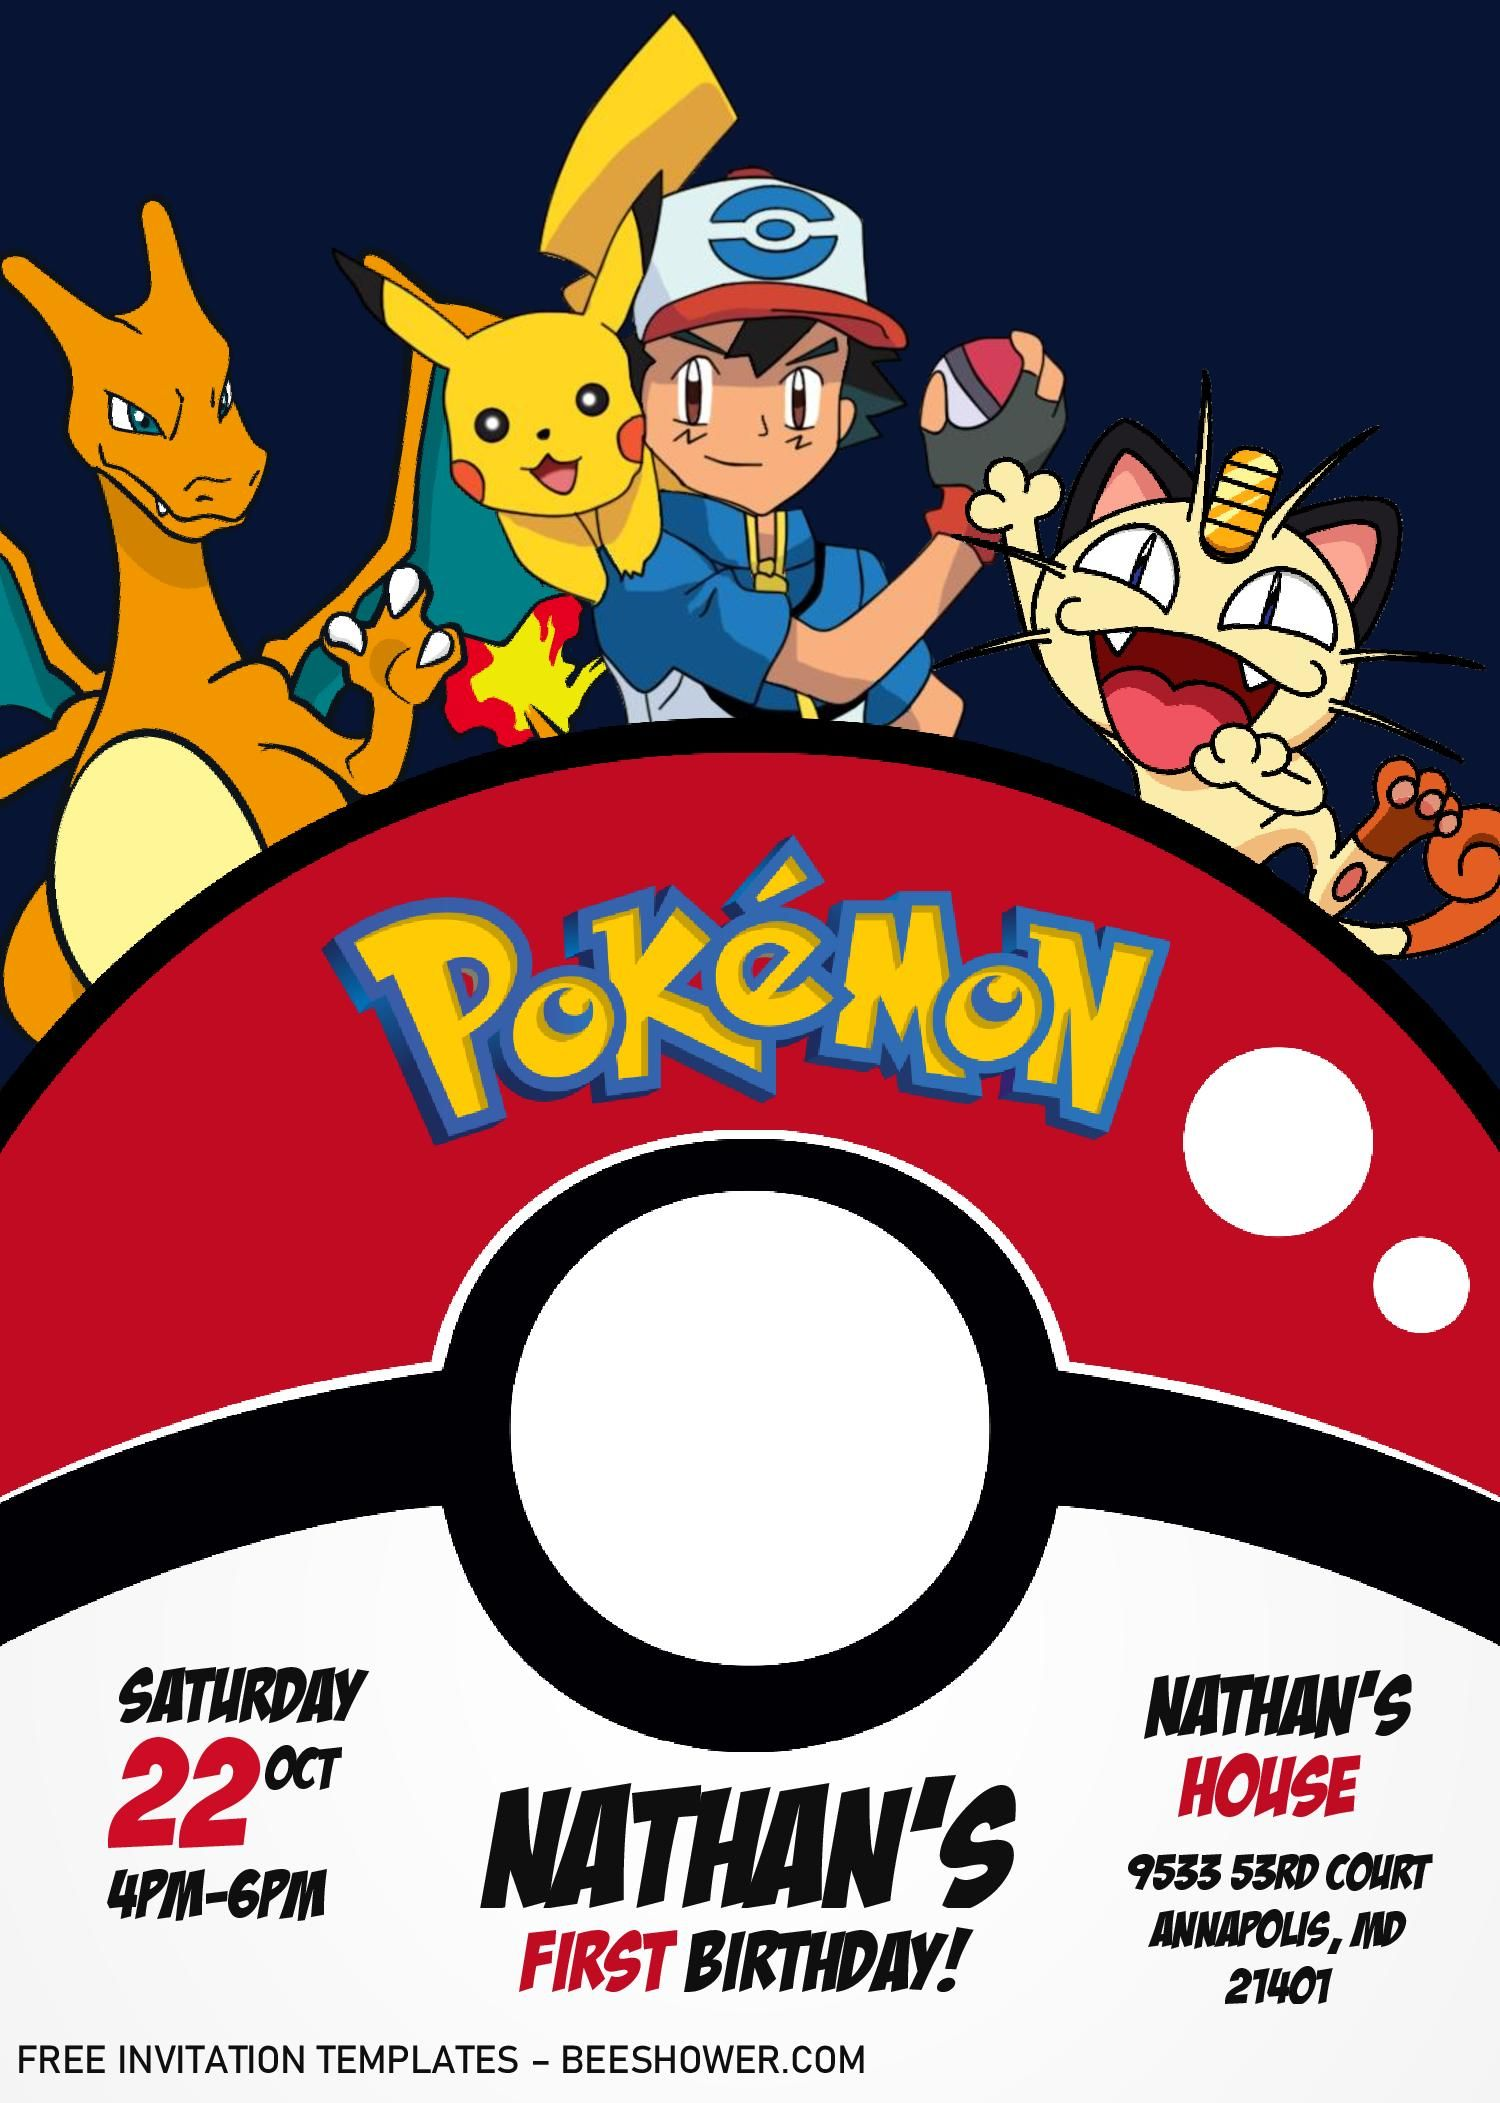 Pokemon Invitation Templates Editable With Ms Word In 2021 Pokemon Invitations Pokemon Party Invitations Printable Baby Shower Invitations